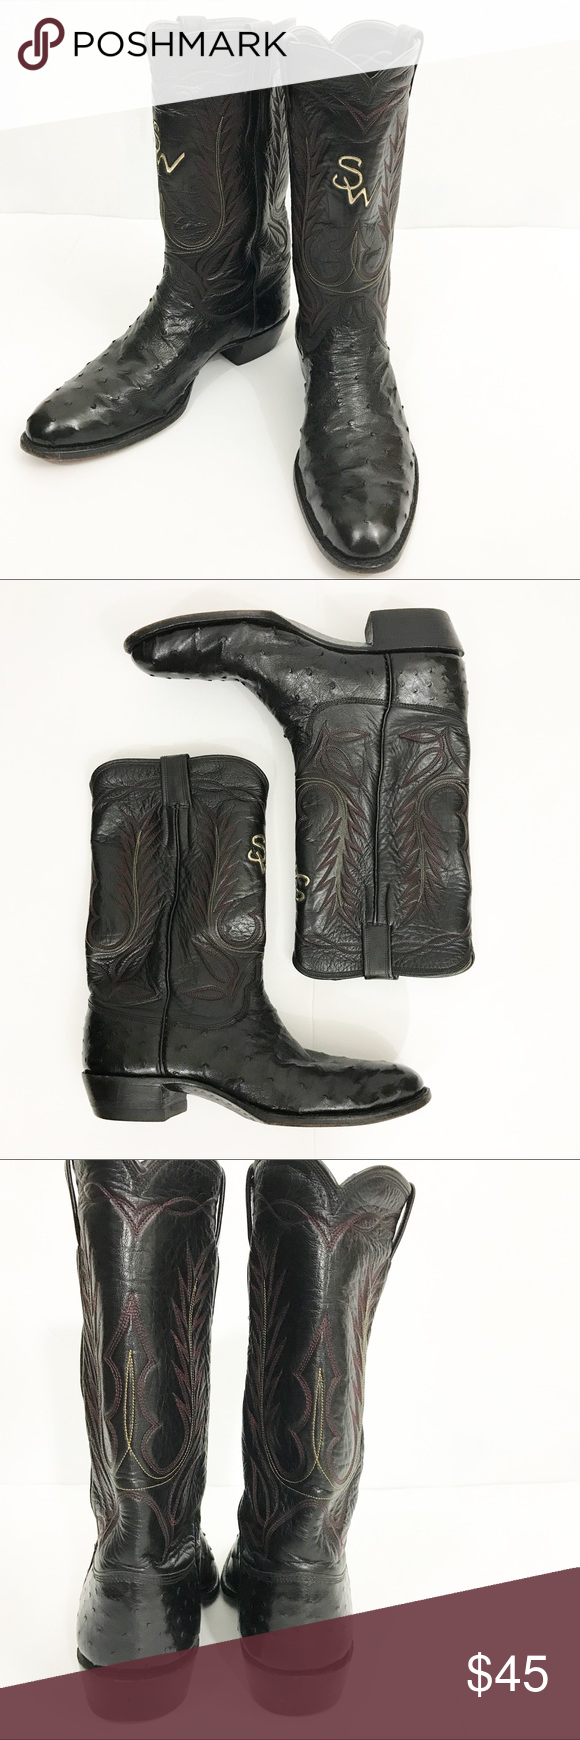 75dff0db818 Biltrite Neoprene Women's Western Boots. Size 12 A beautiful, black ...